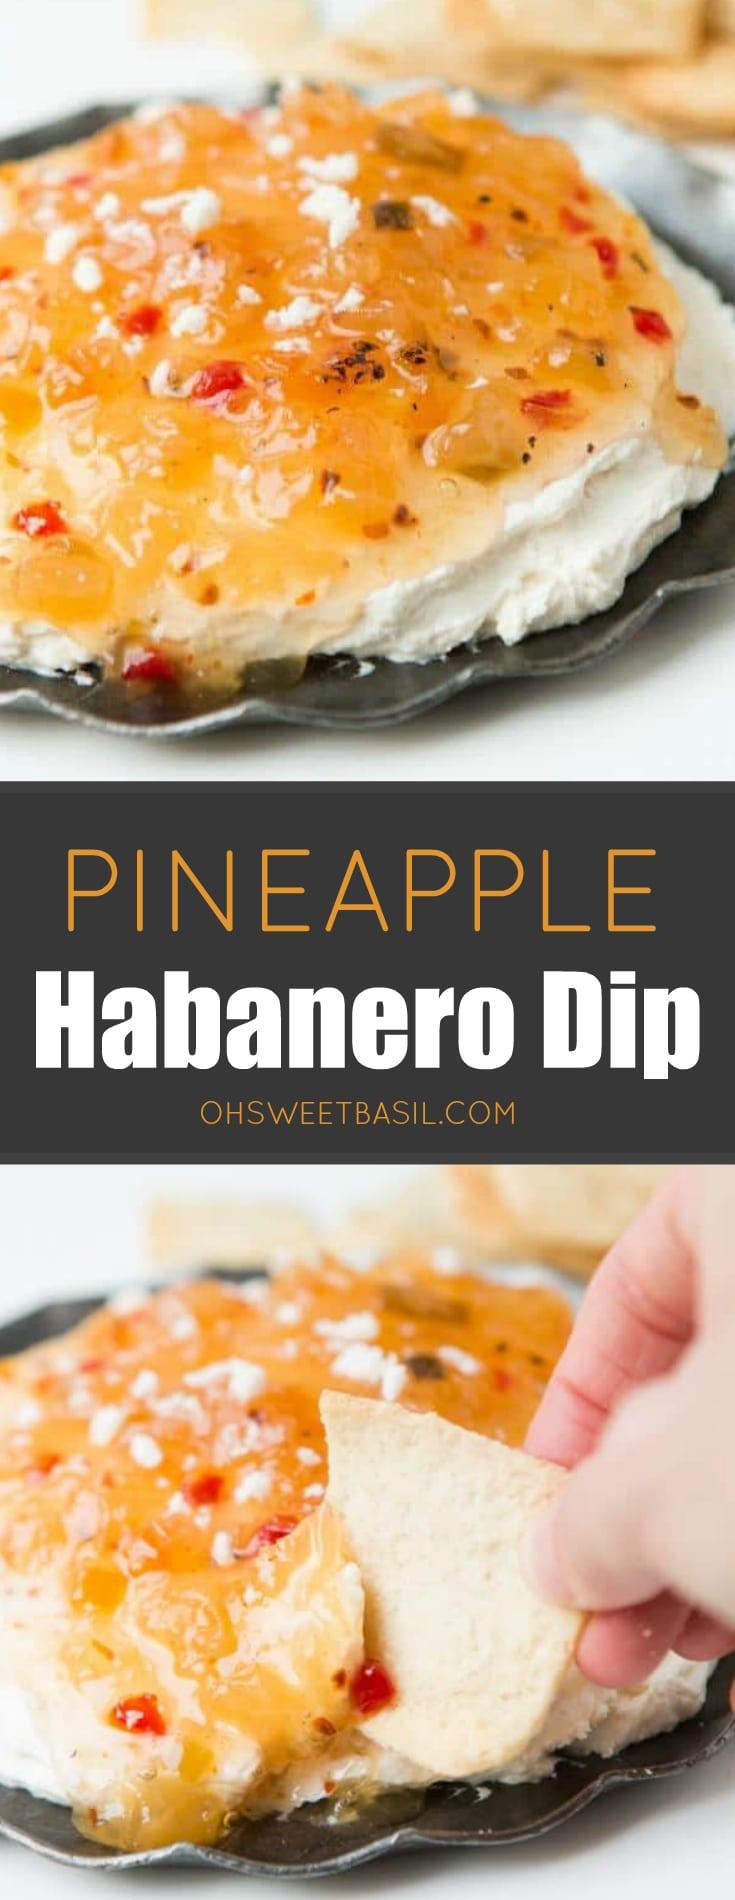 Pineapple Habanero Dip